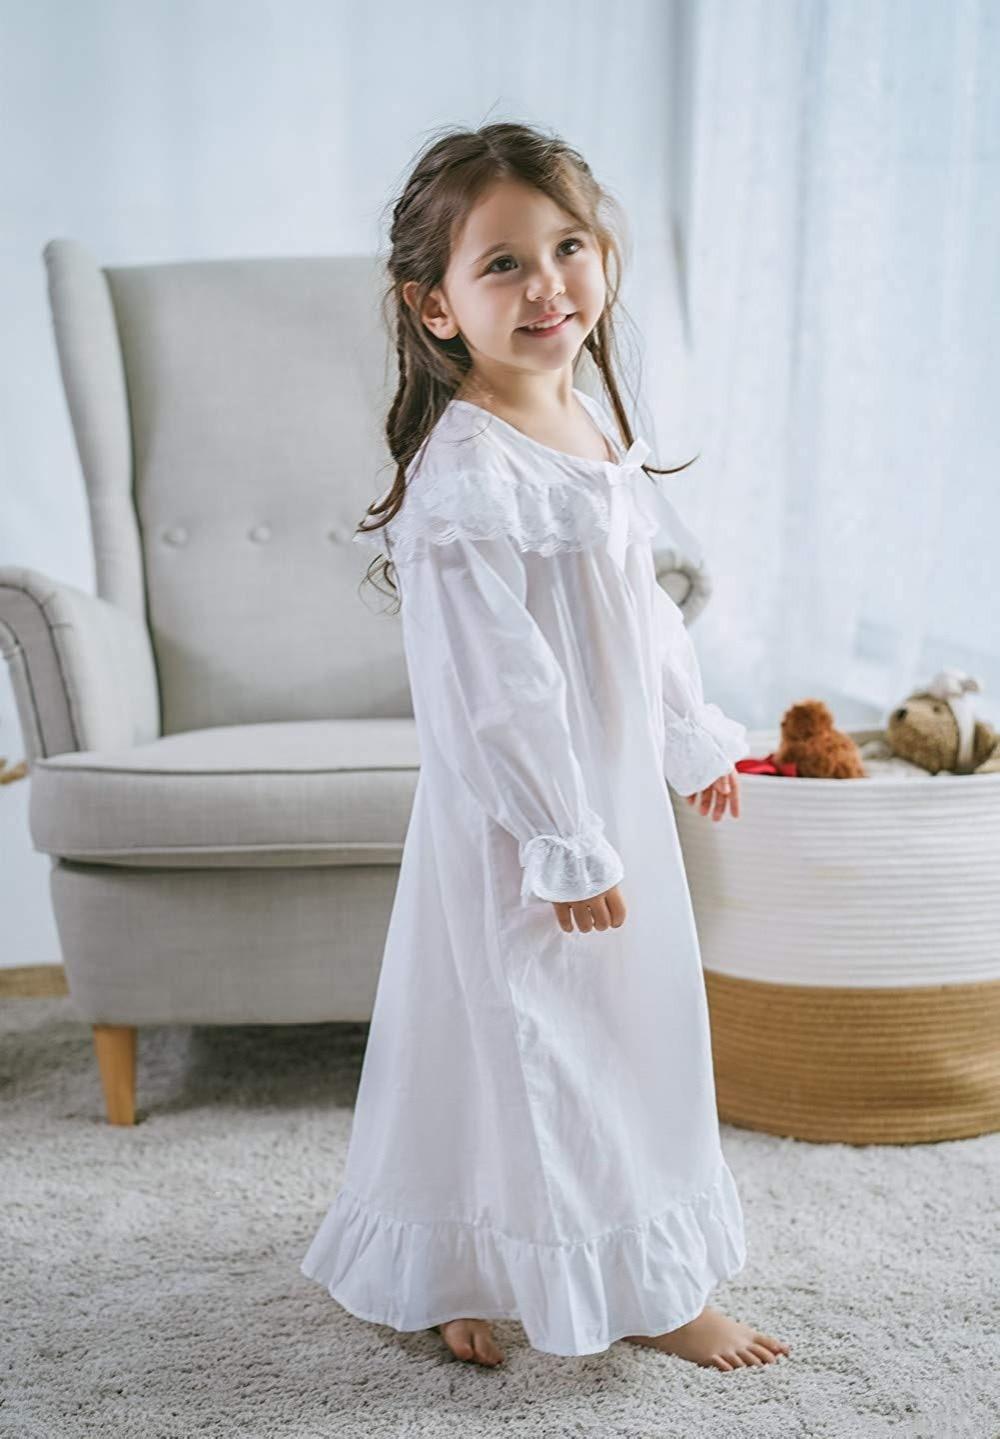 Baby Girl Clothes Princess Nightgown Long Sleeve Sleep Shirts Nightshirts Pajamas Christmas Dress Sleepwear kids for 3-12 Years (6)